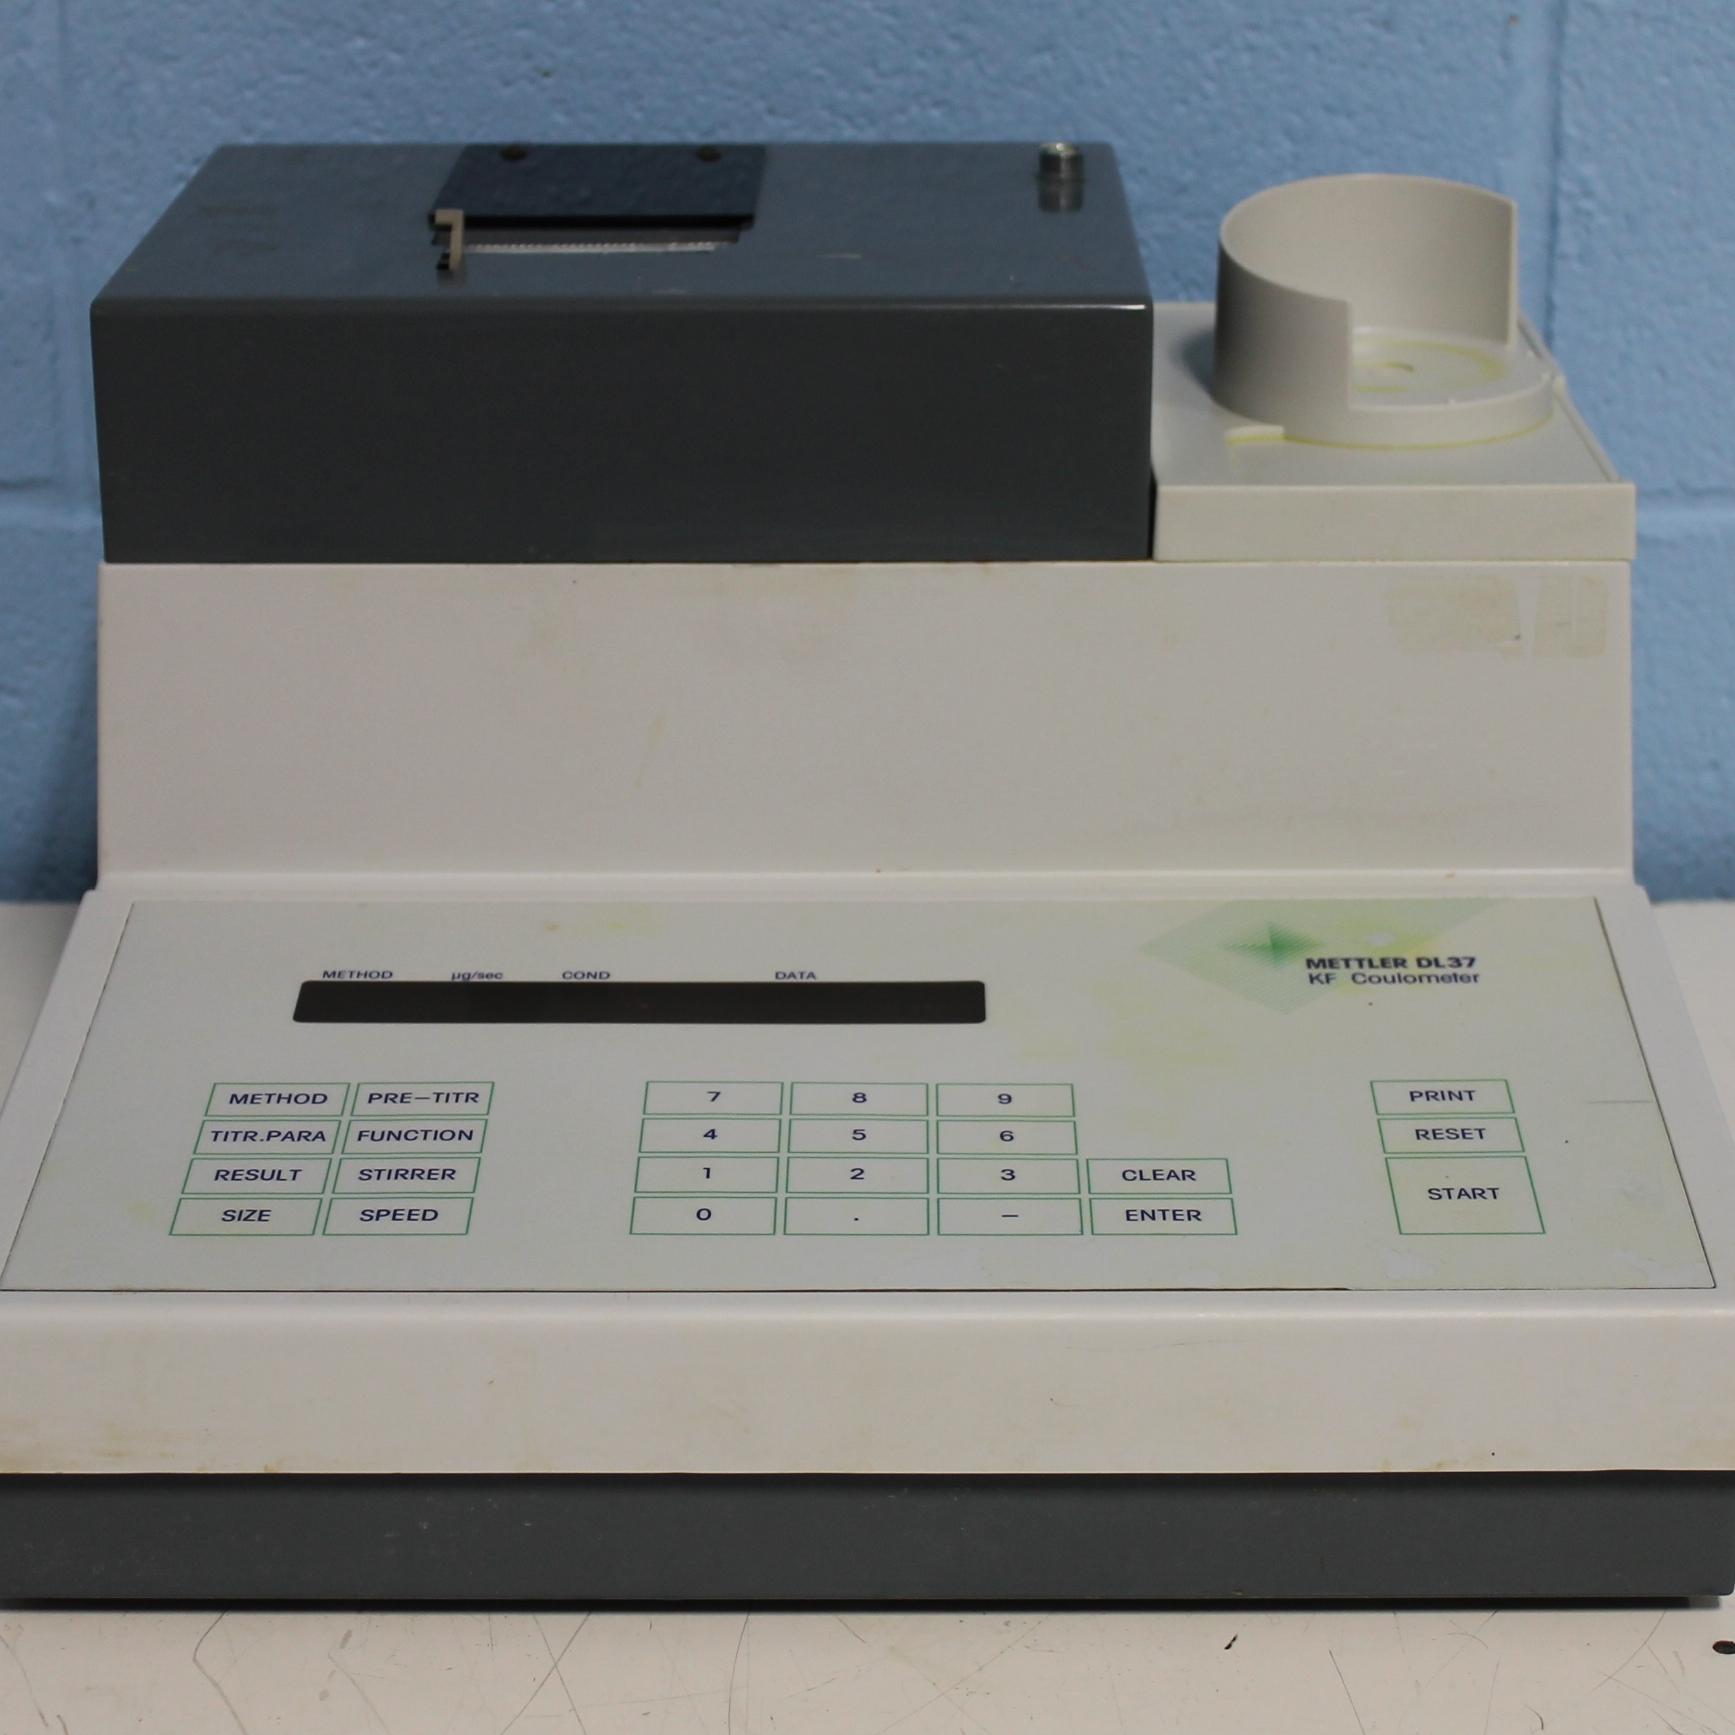 DL37 KF Coulometer